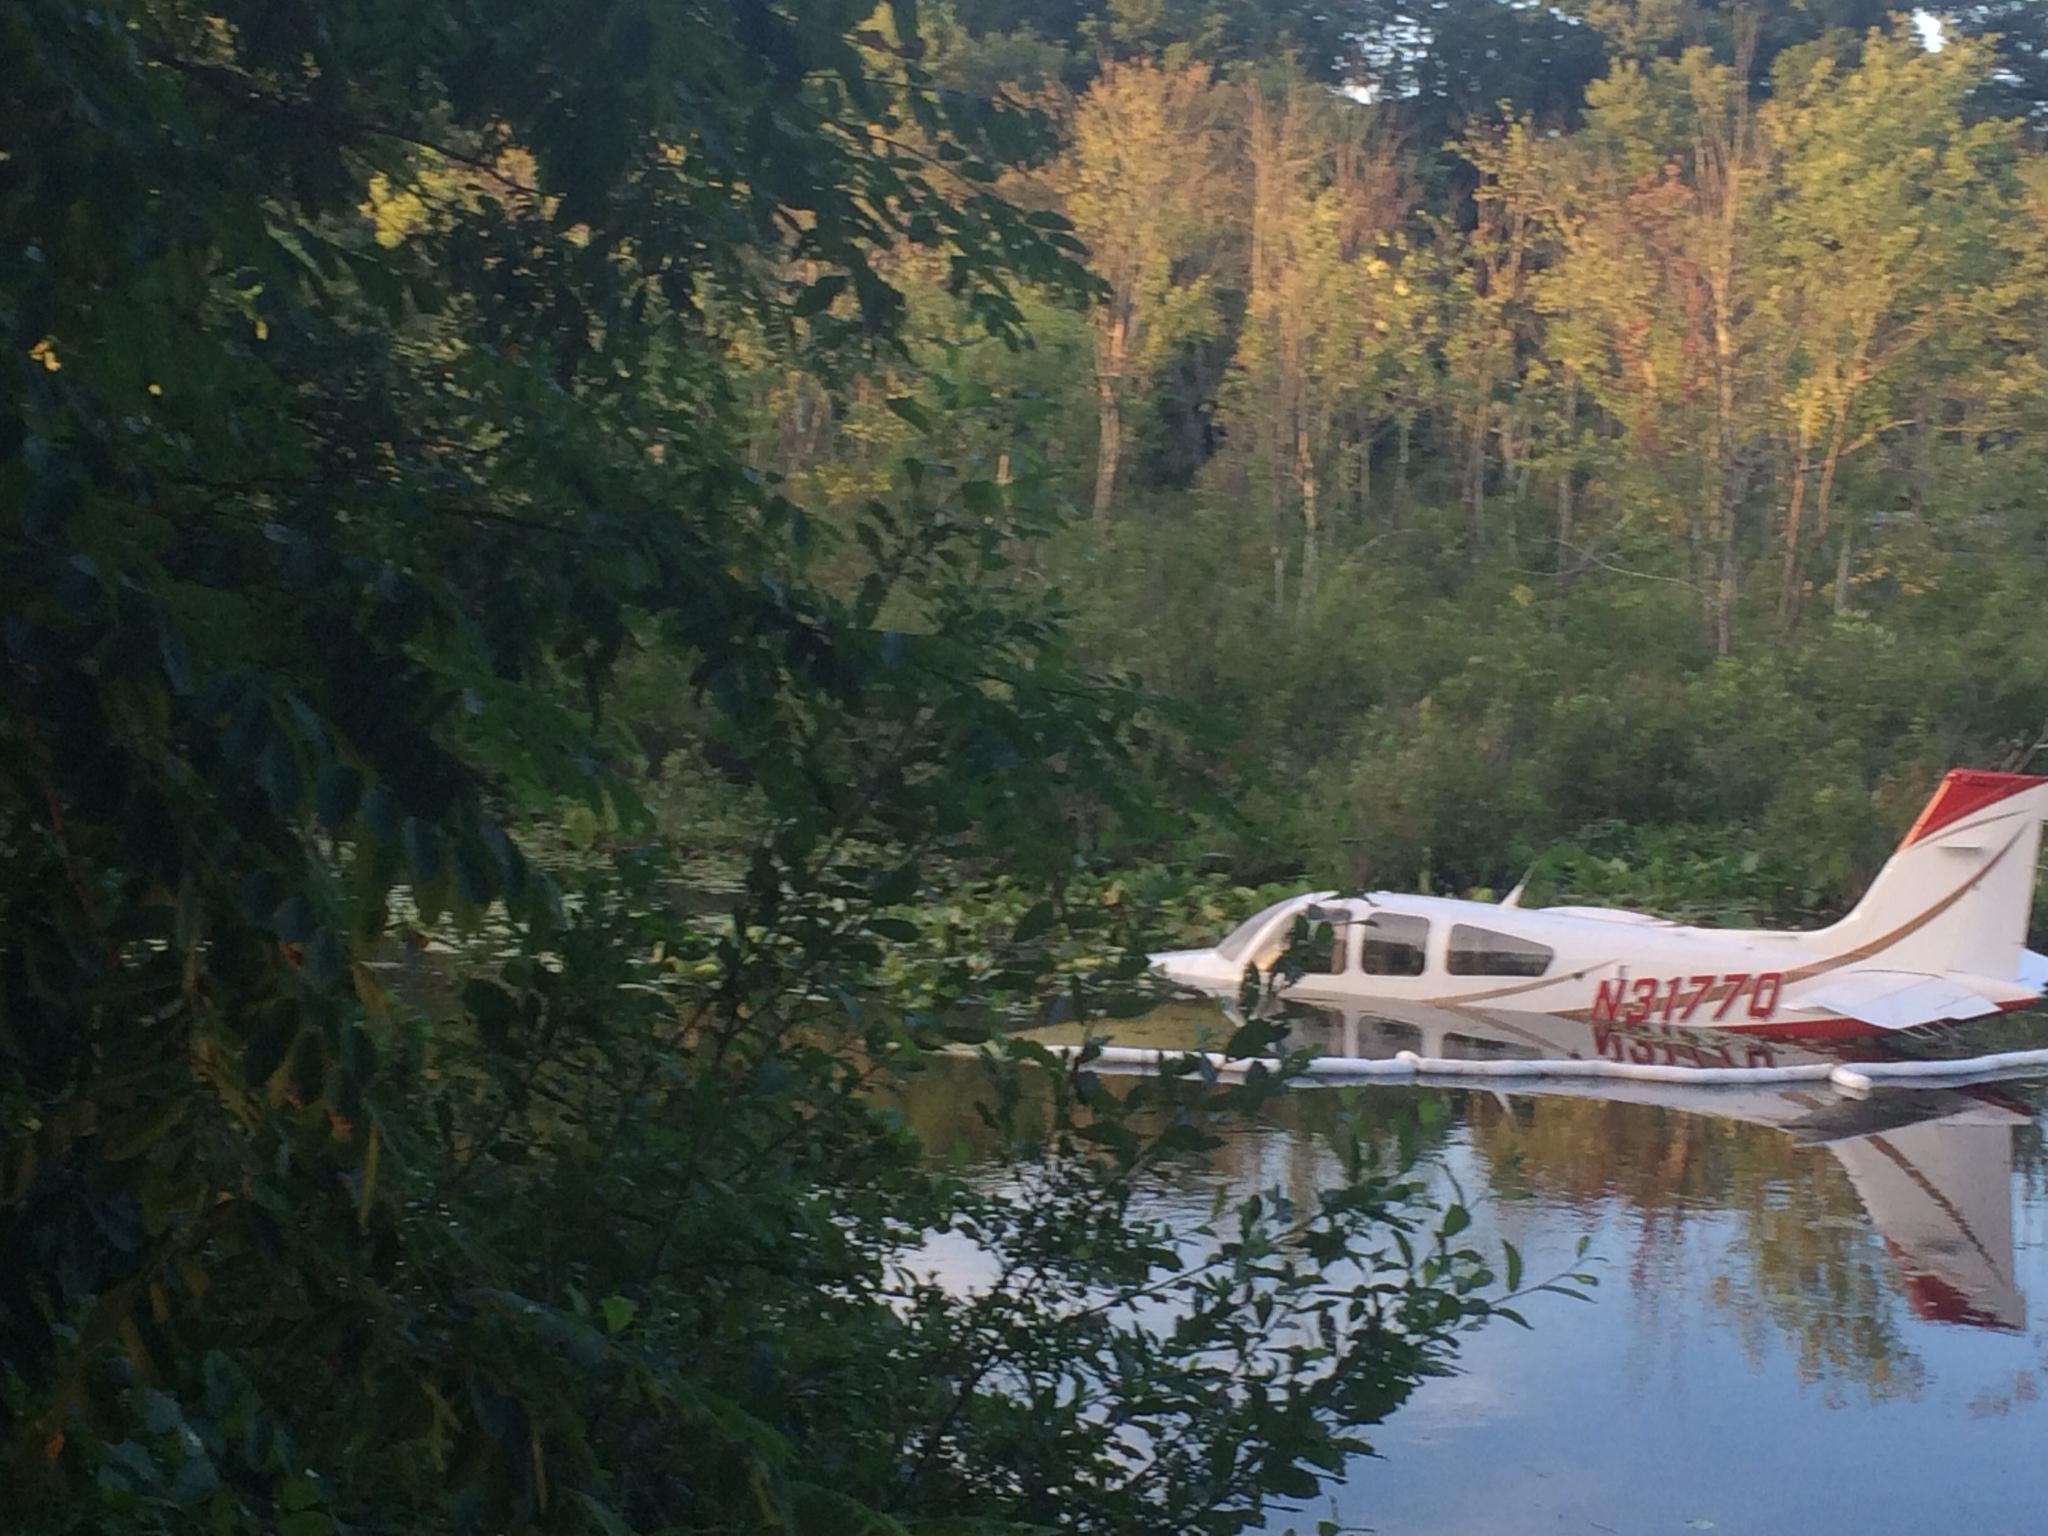 The Edge Danbury >> Plane crashes into swamp near Danbury airport - NewsTimes